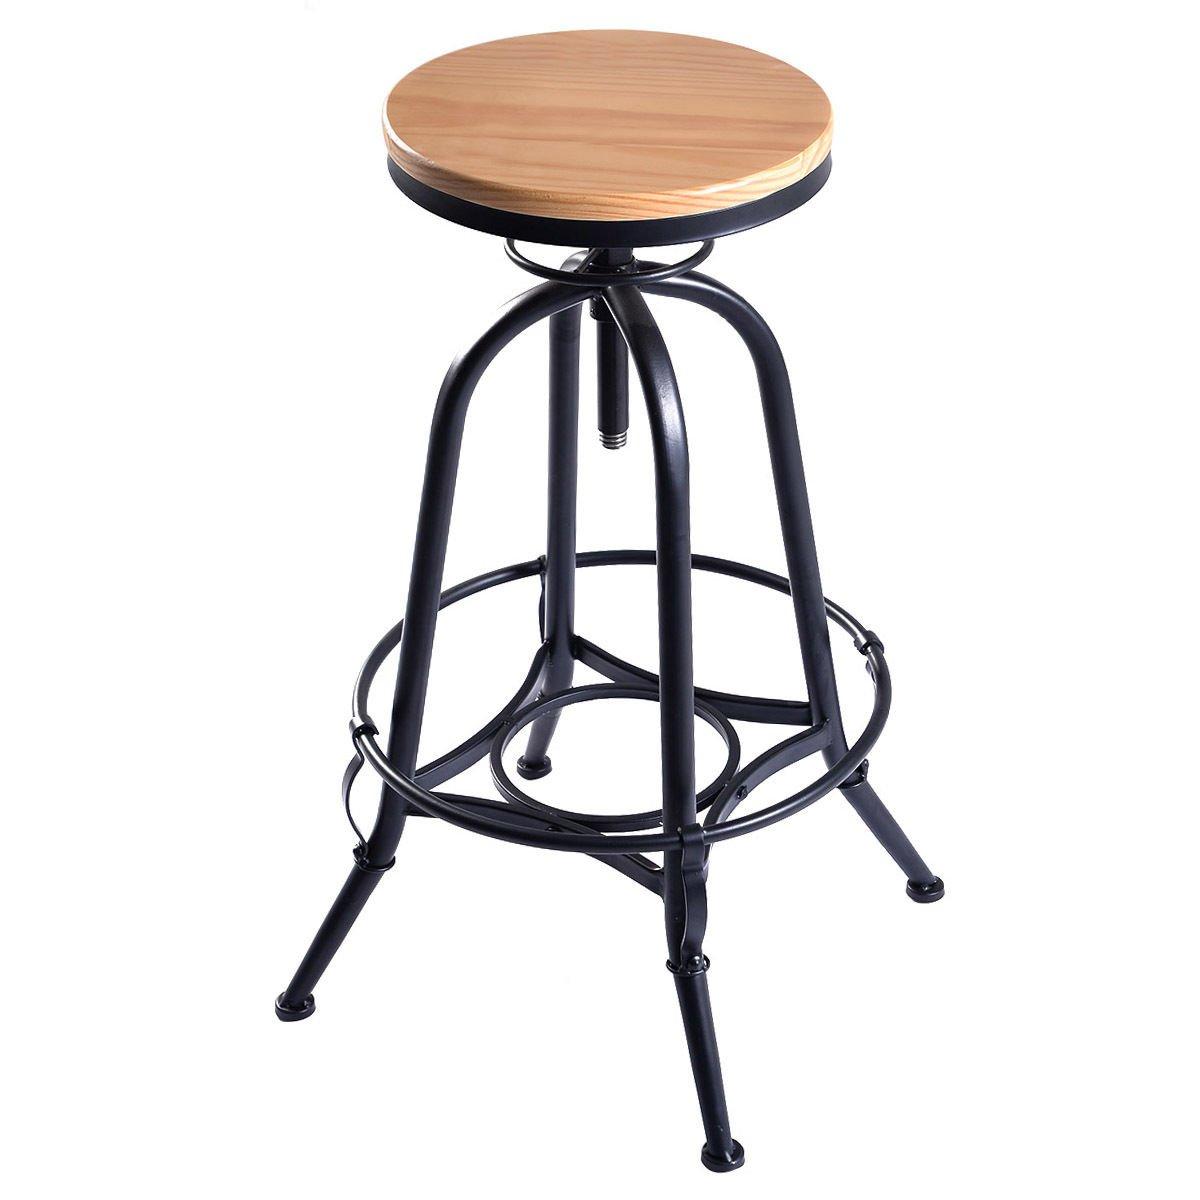 New Vintage Bar Stool Industrial Metal Design Wood Top Adjustable Height Swivel